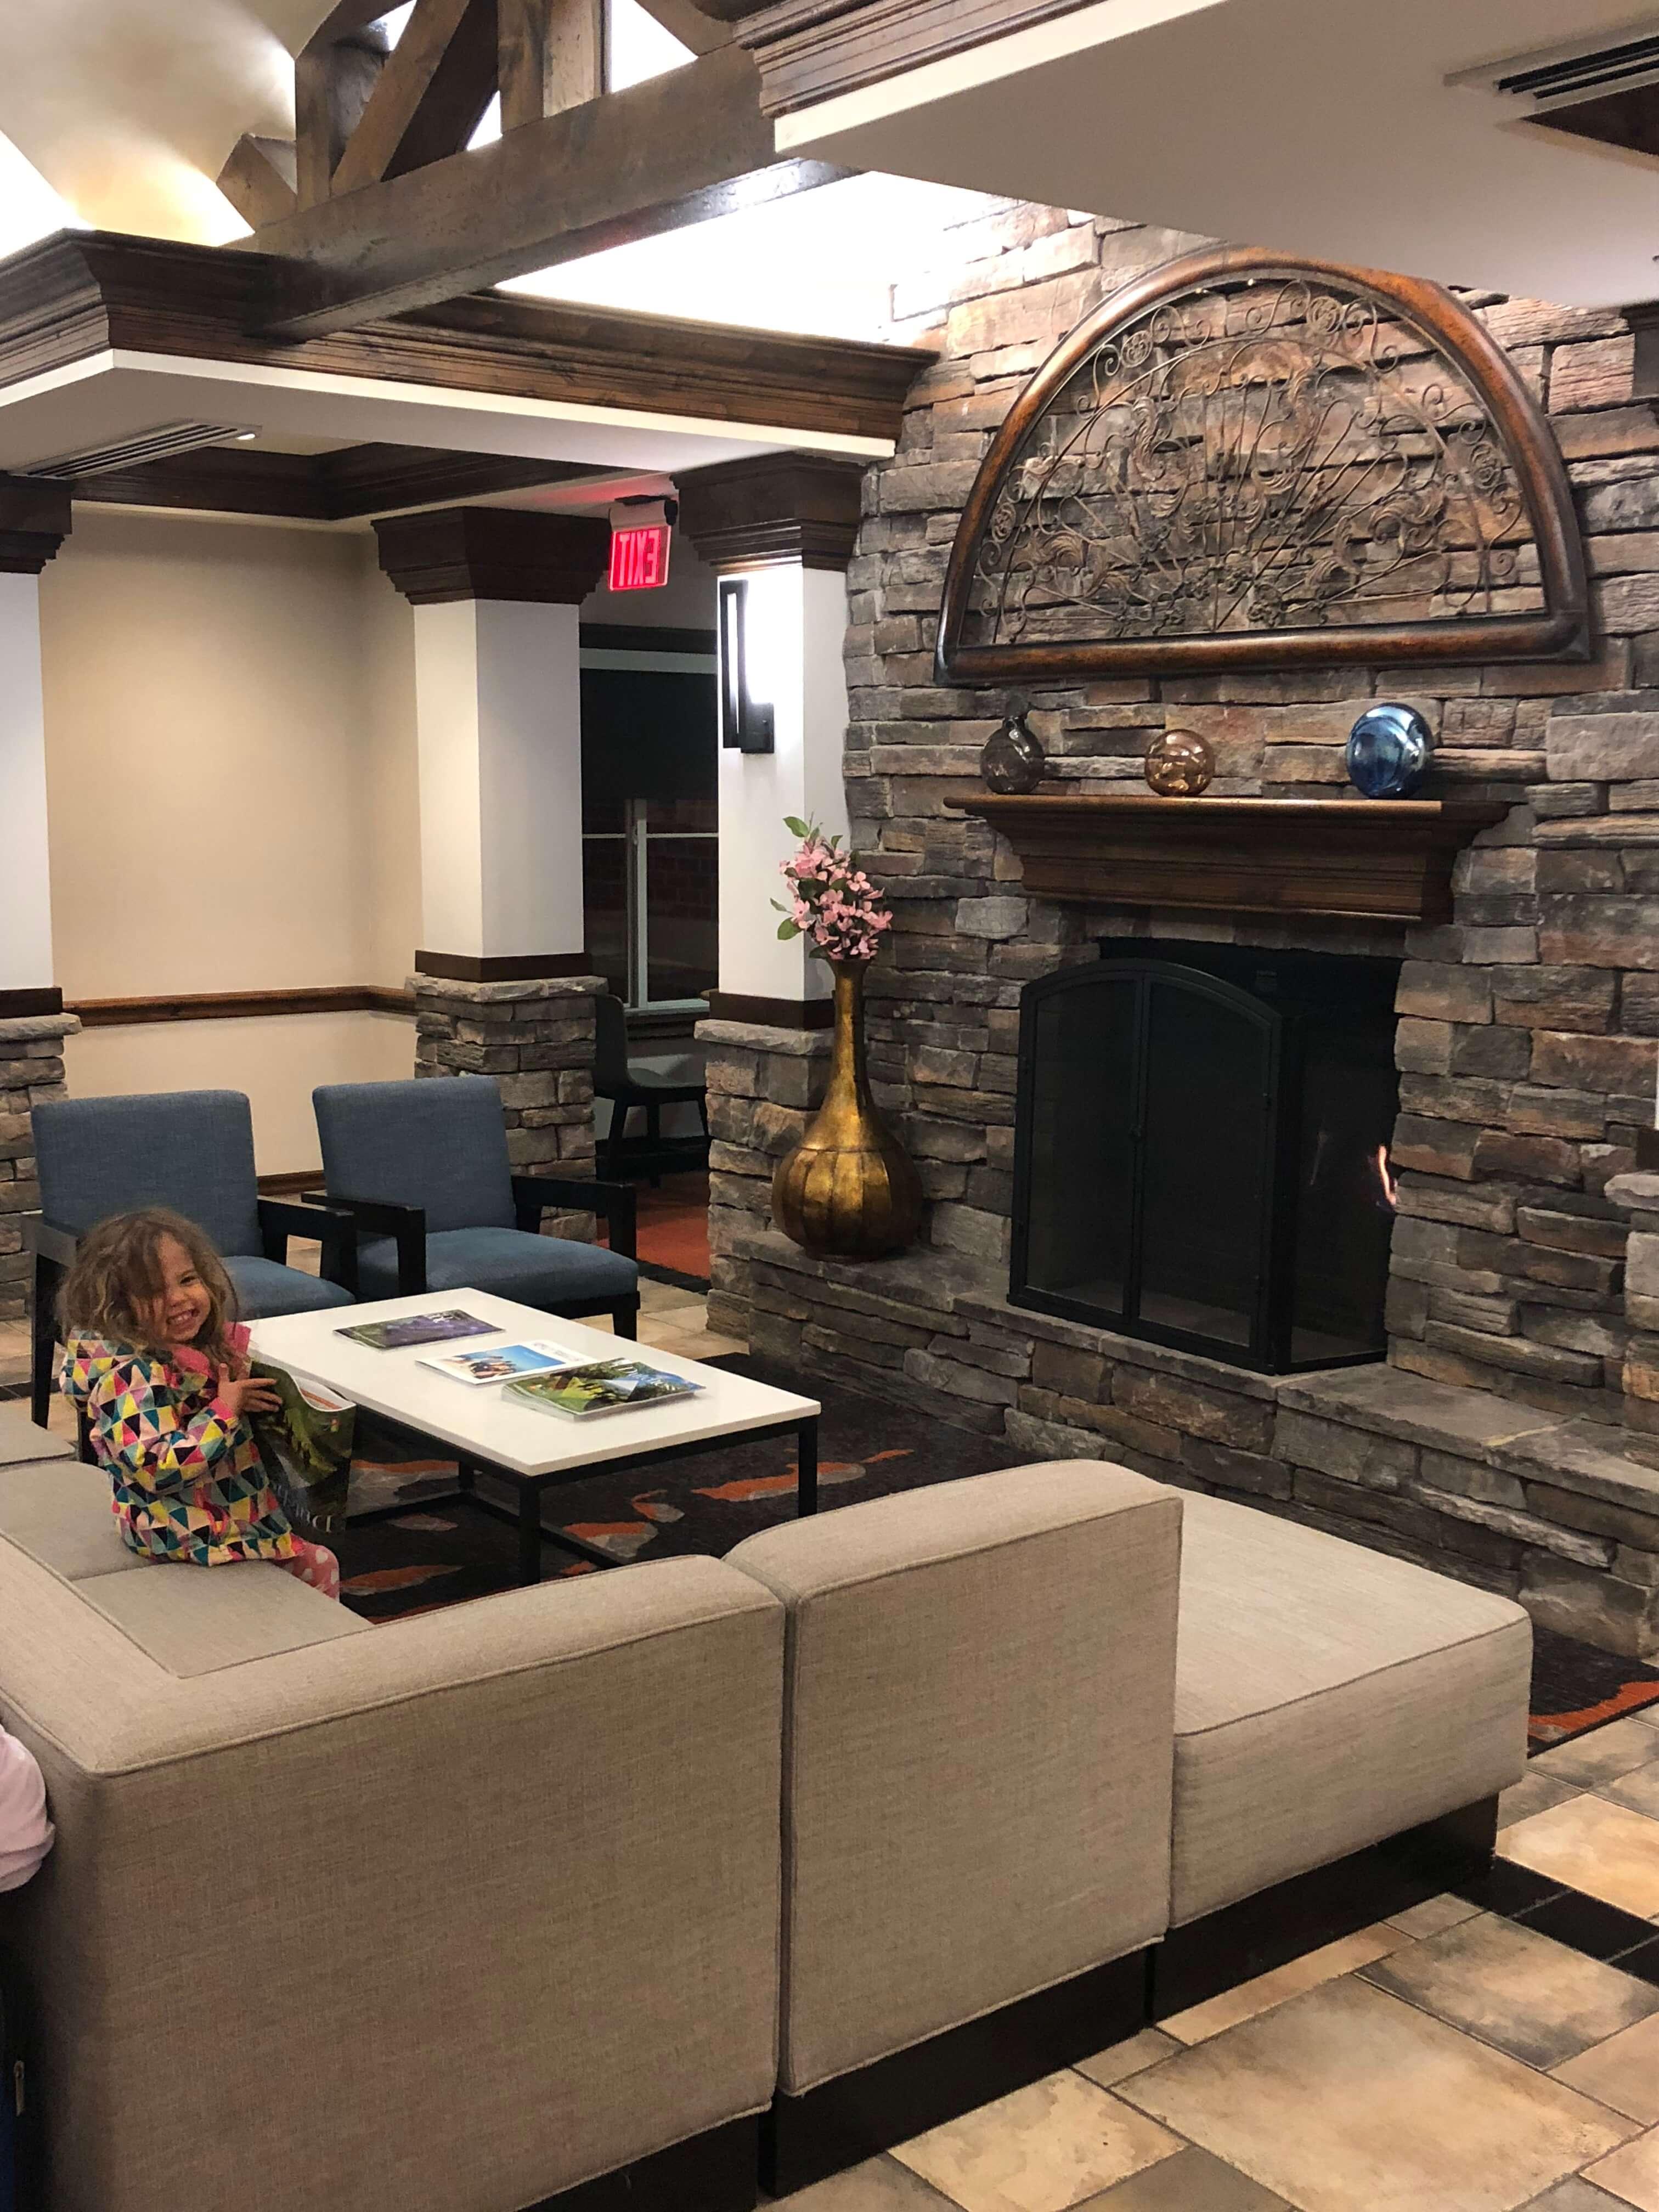 Luxurious lobby for Families at Hyatt House Fishkill/Poughkeepsie